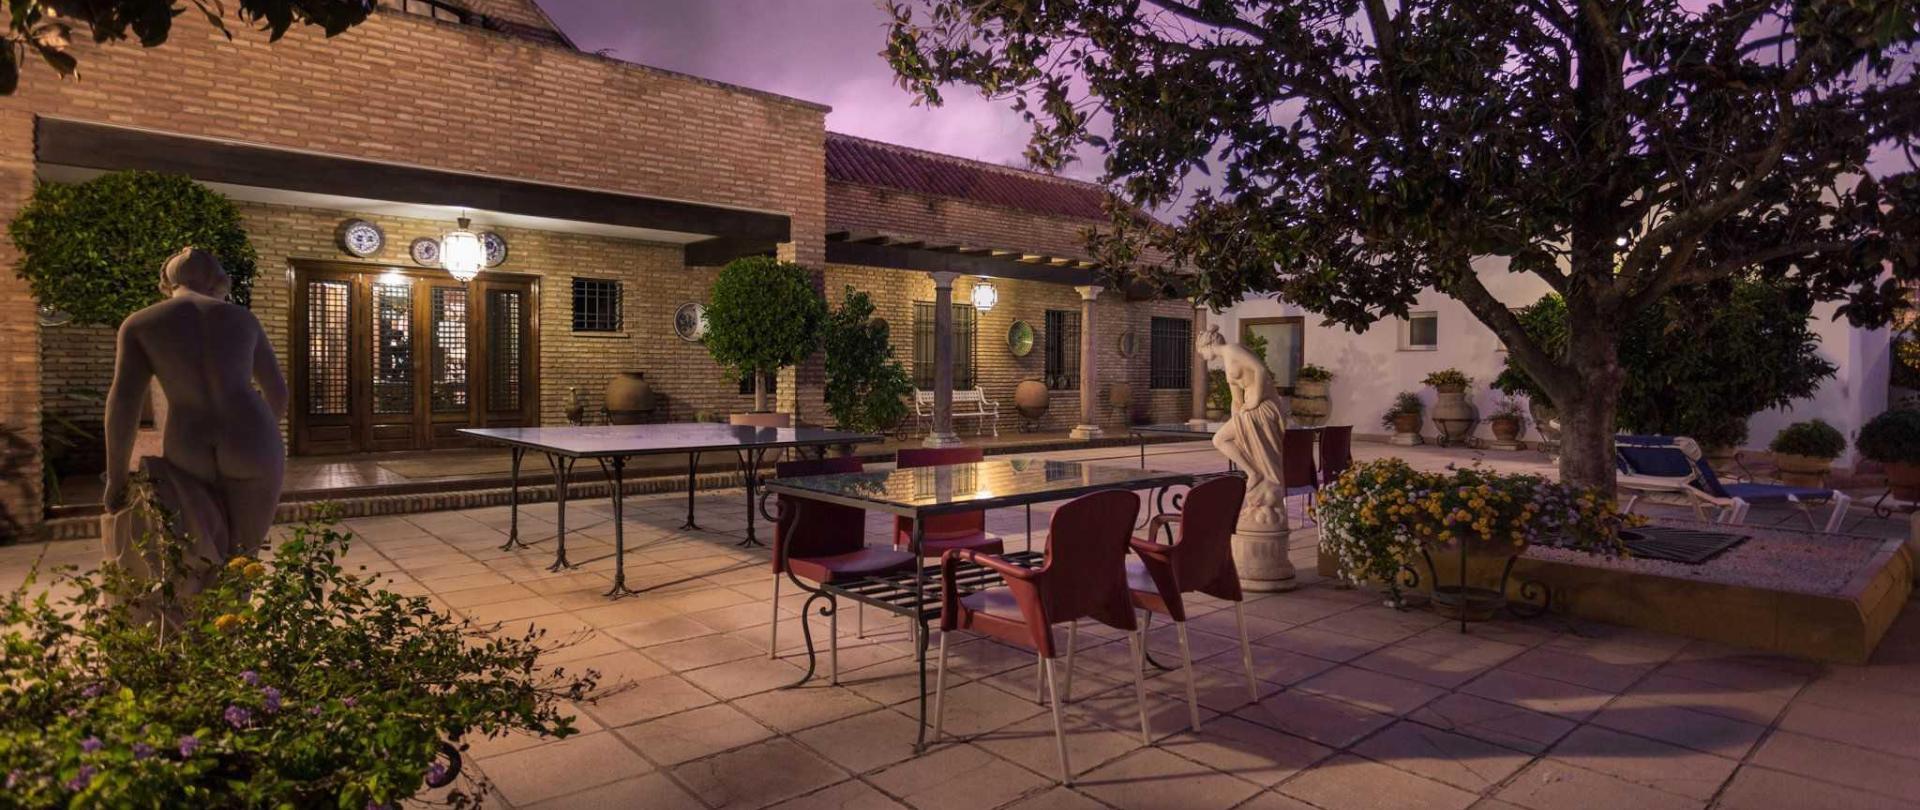 patio-noche-2-2.JPG